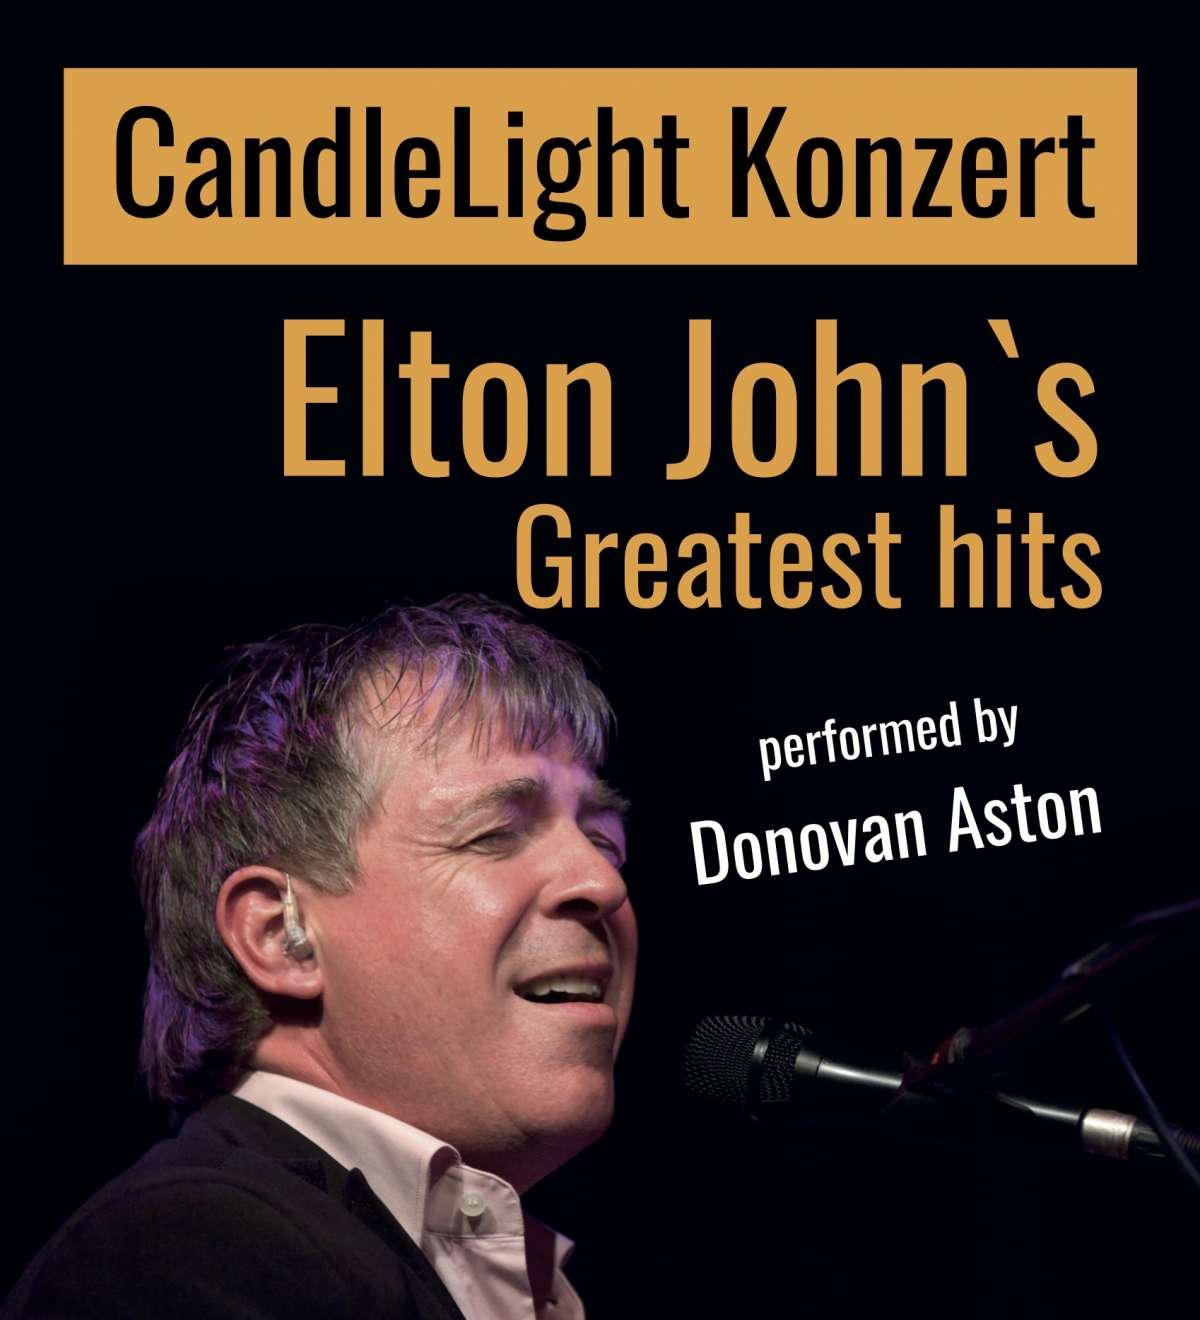 Sir Elton John`s Greatest hits